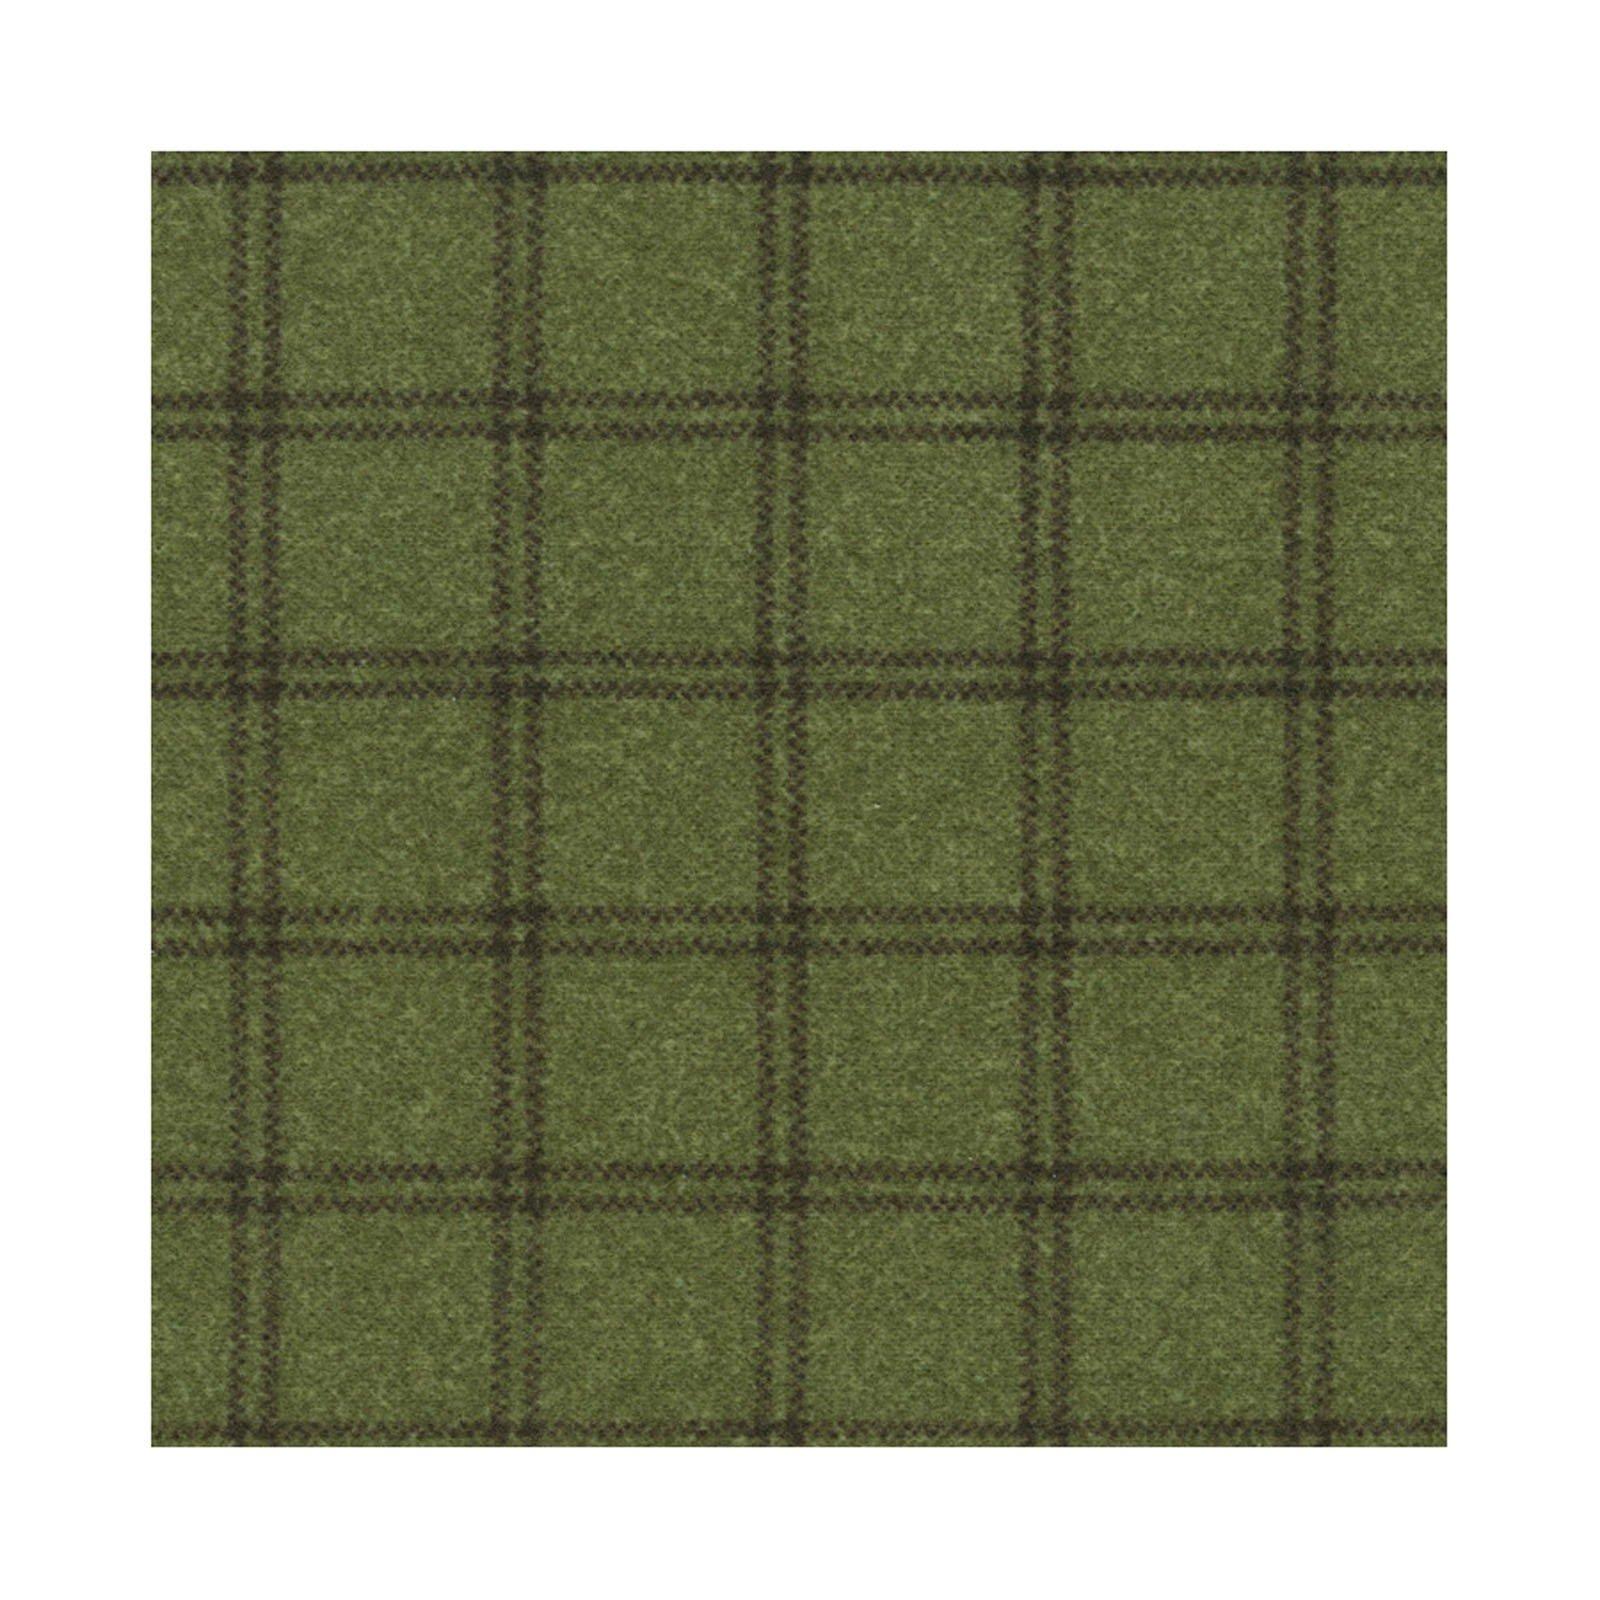 Woolies Plaid Green